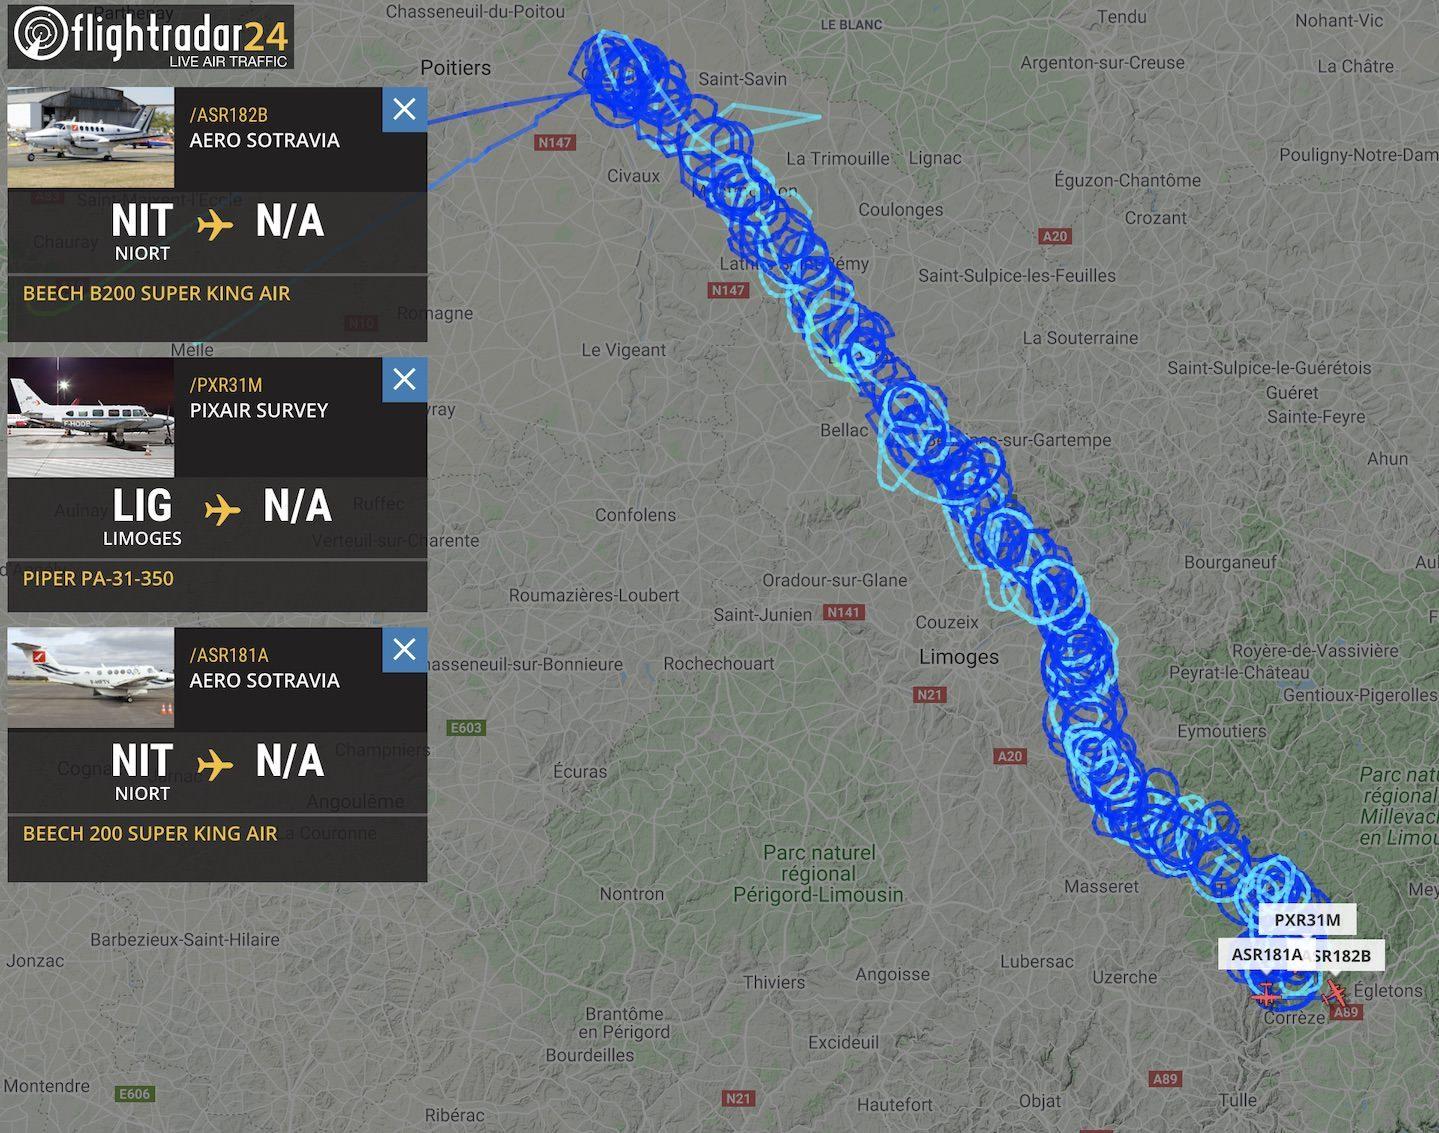 Tour de France television relay aircraft